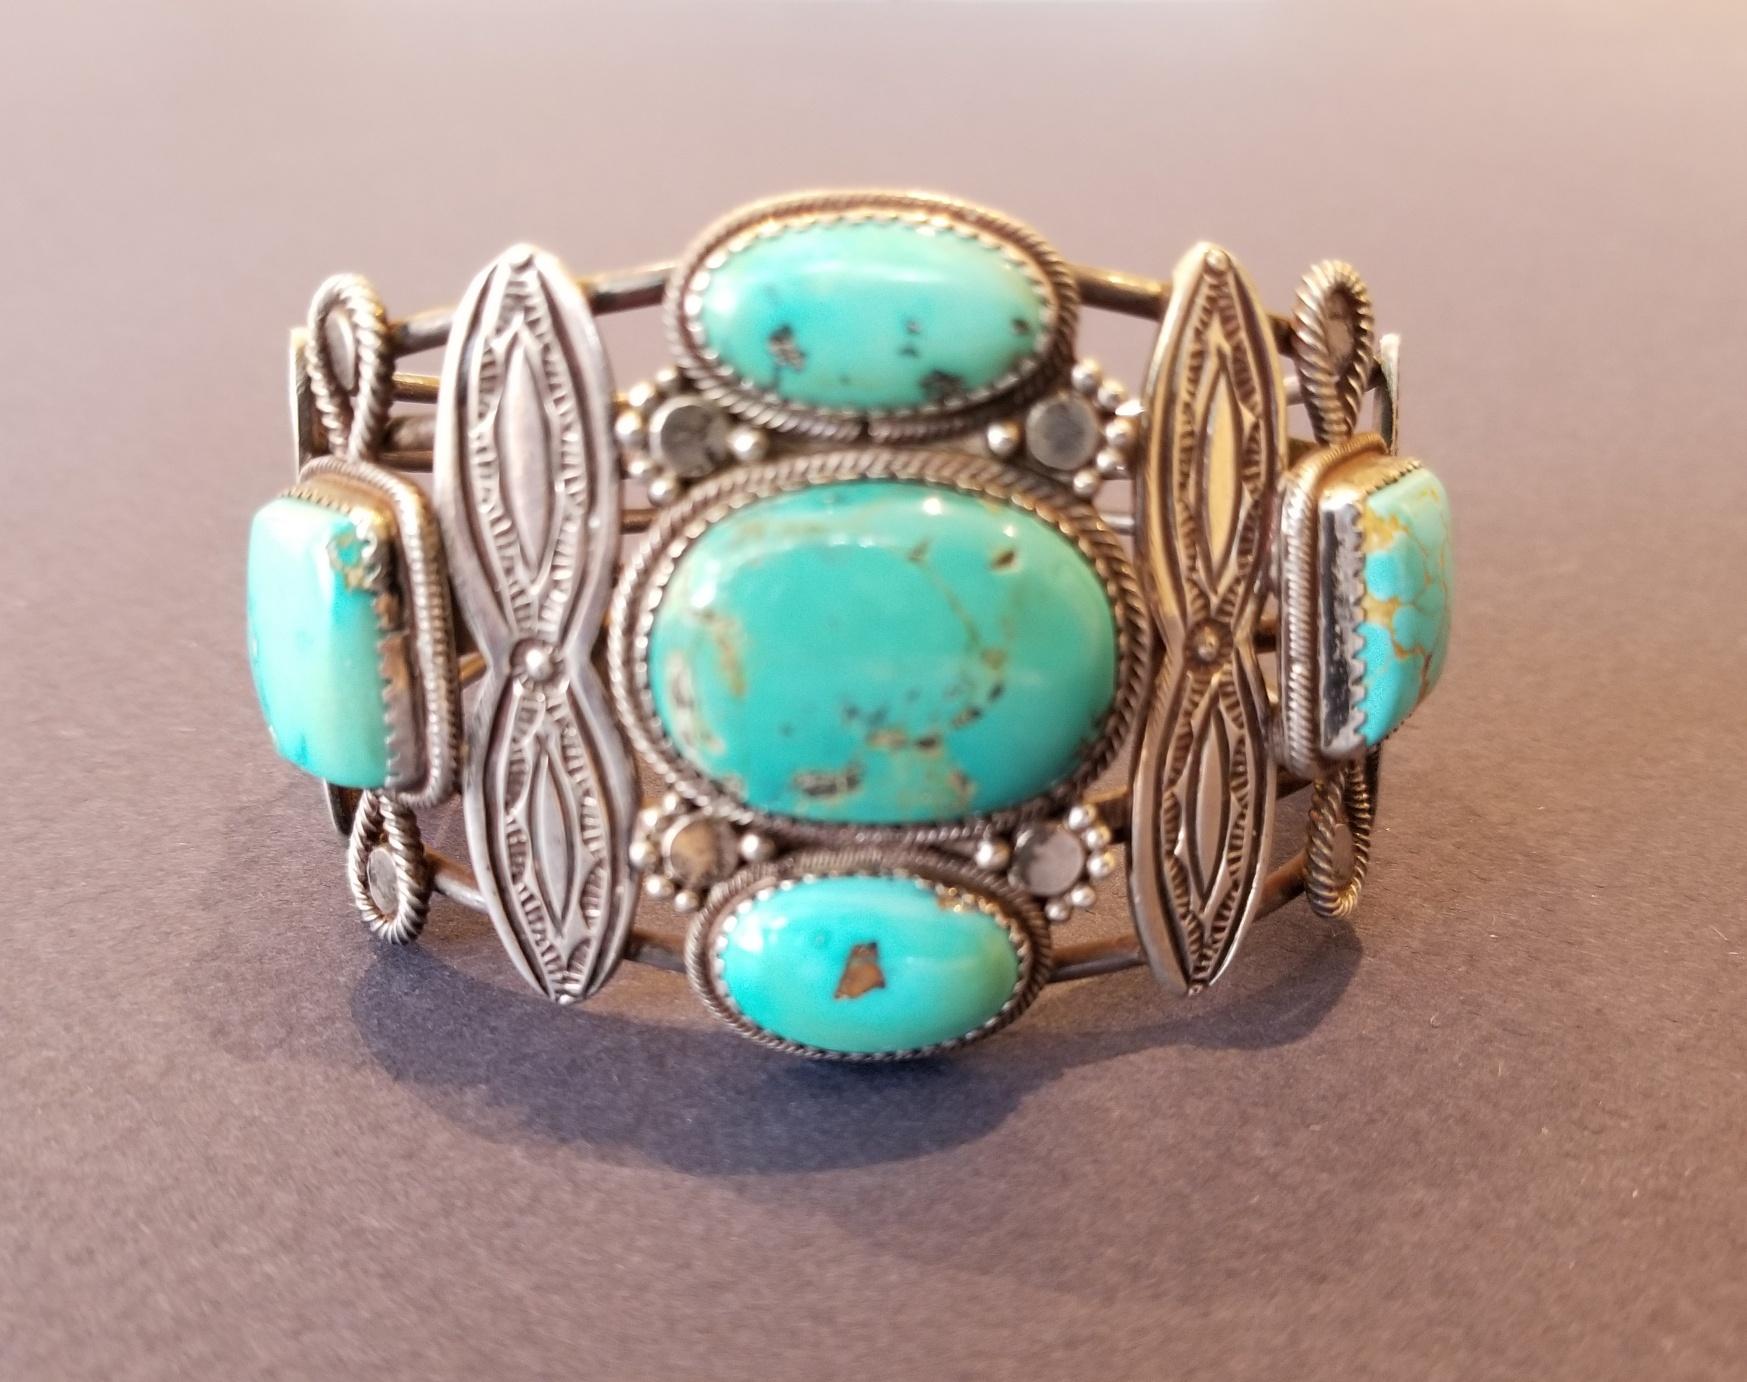 Navajo or Pueblo intricate cuff